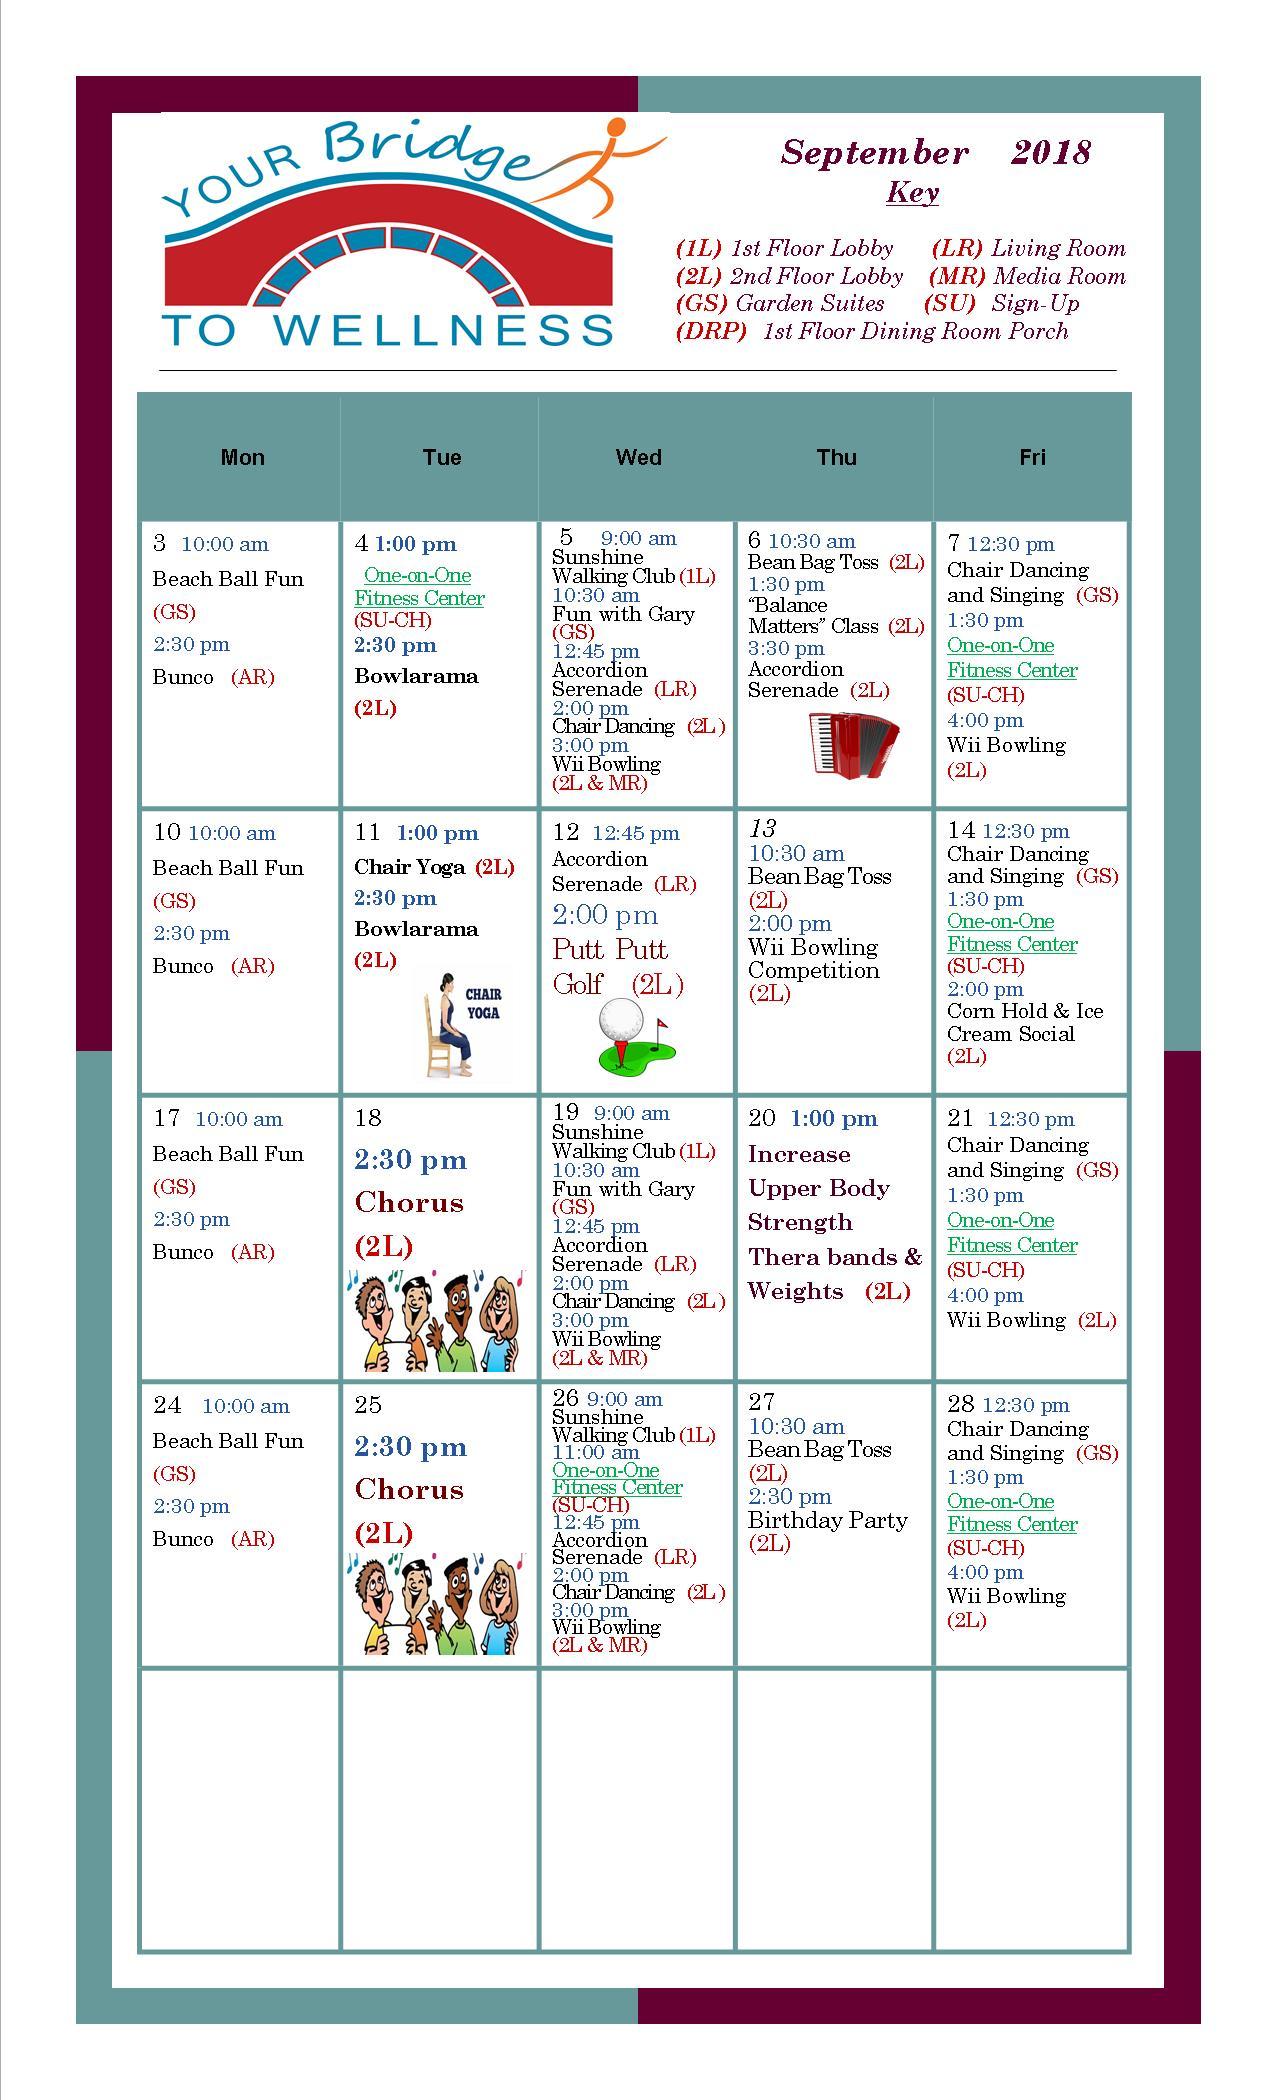 September 2018 Wellness Calendar - Bridges Retirement